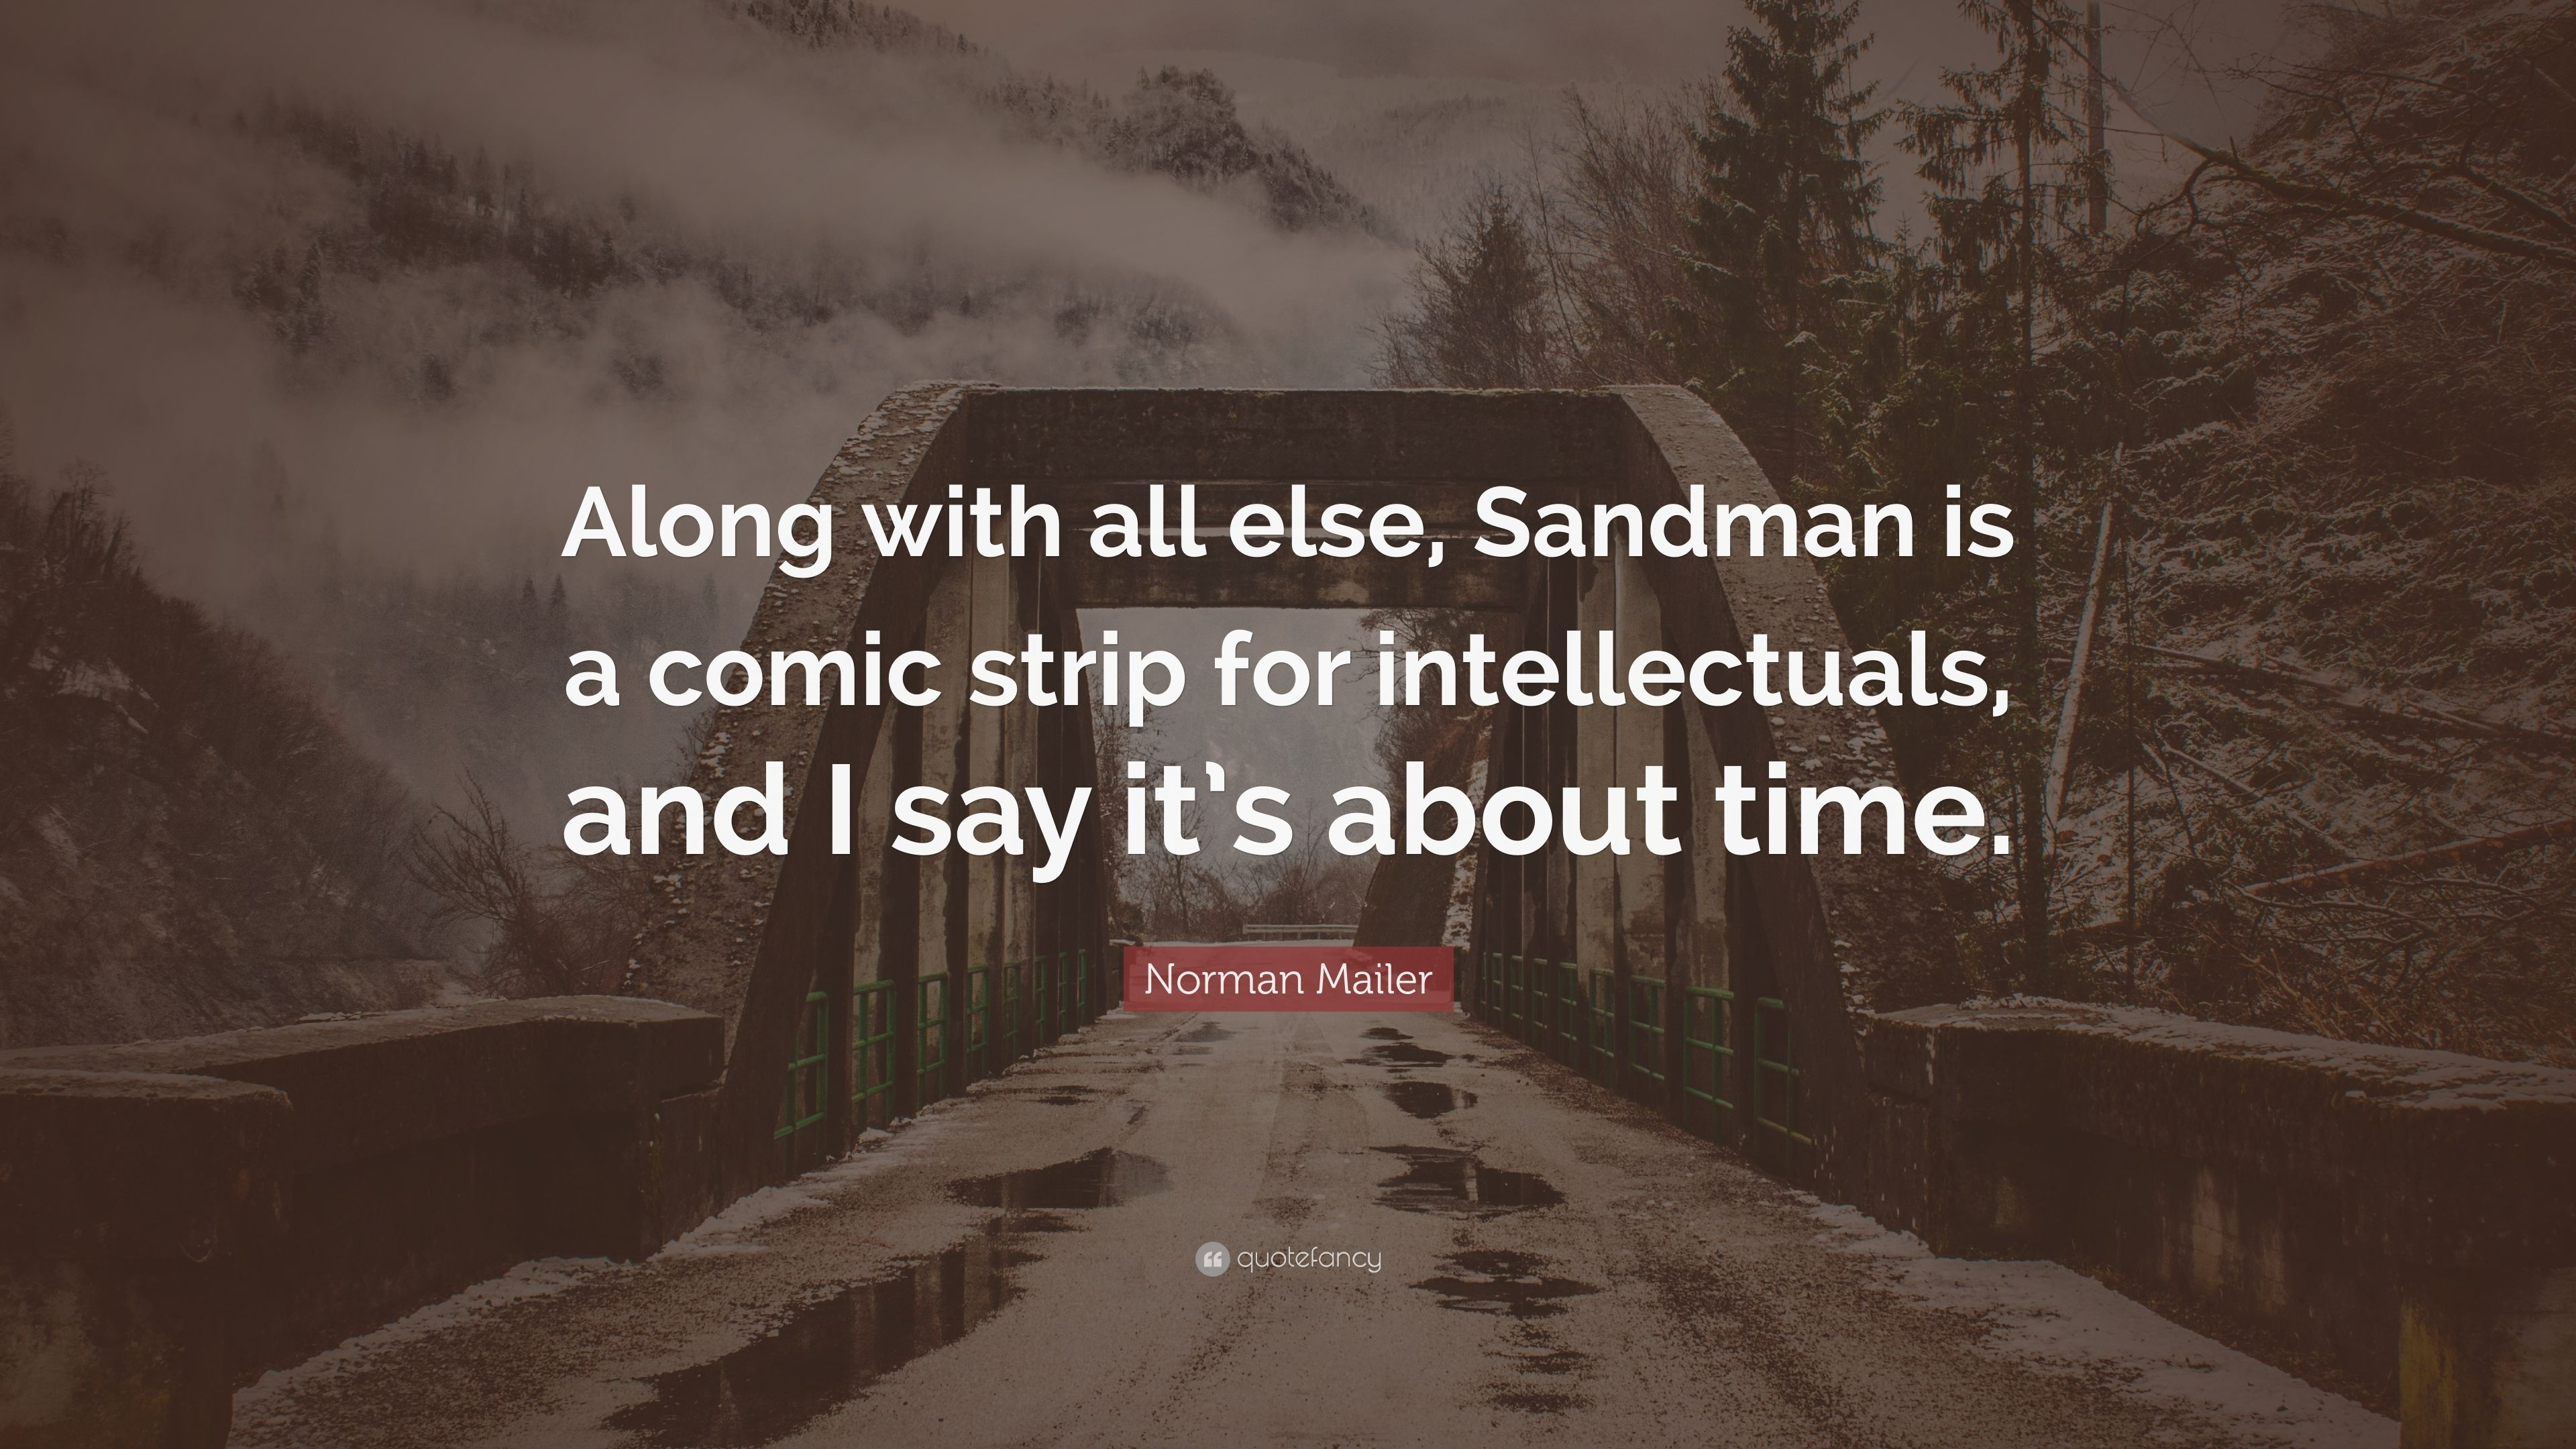 Sandman Comic Quotes Twitter thumbnail